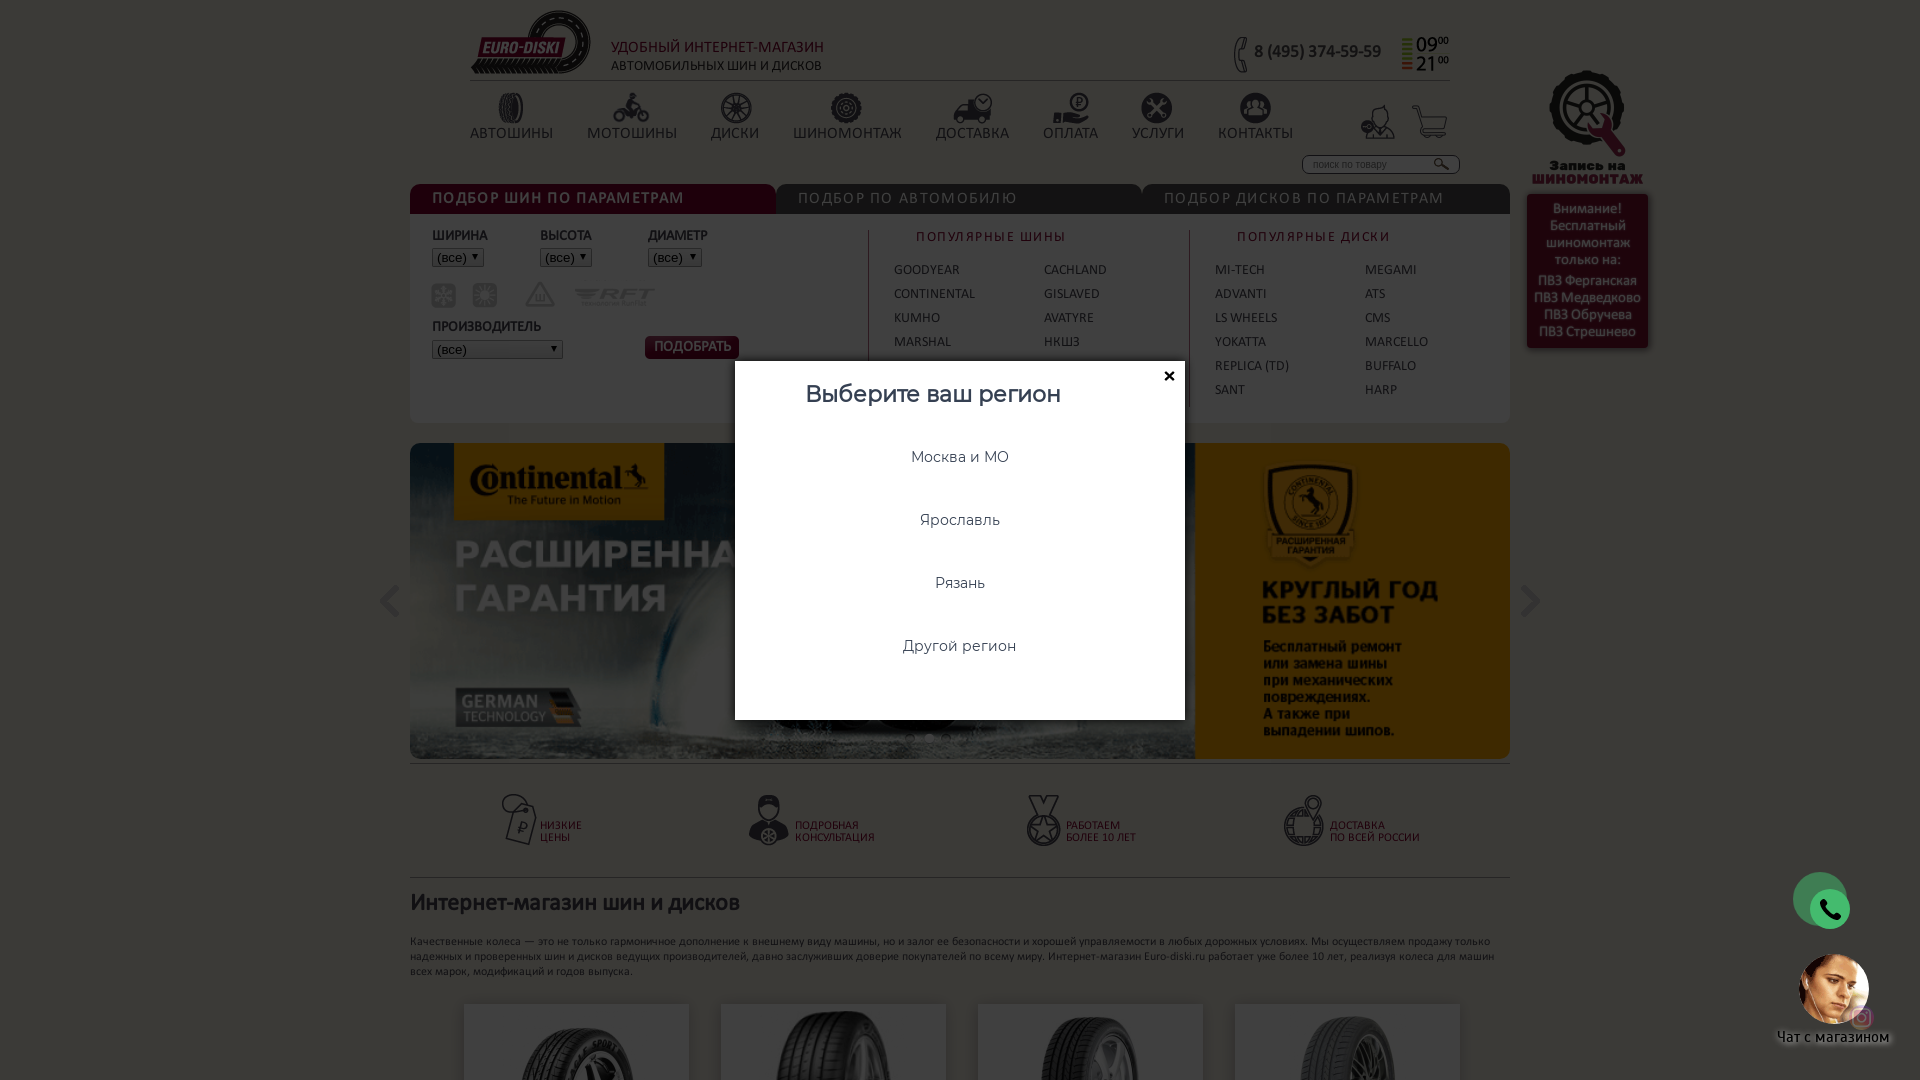 Euro-diski website